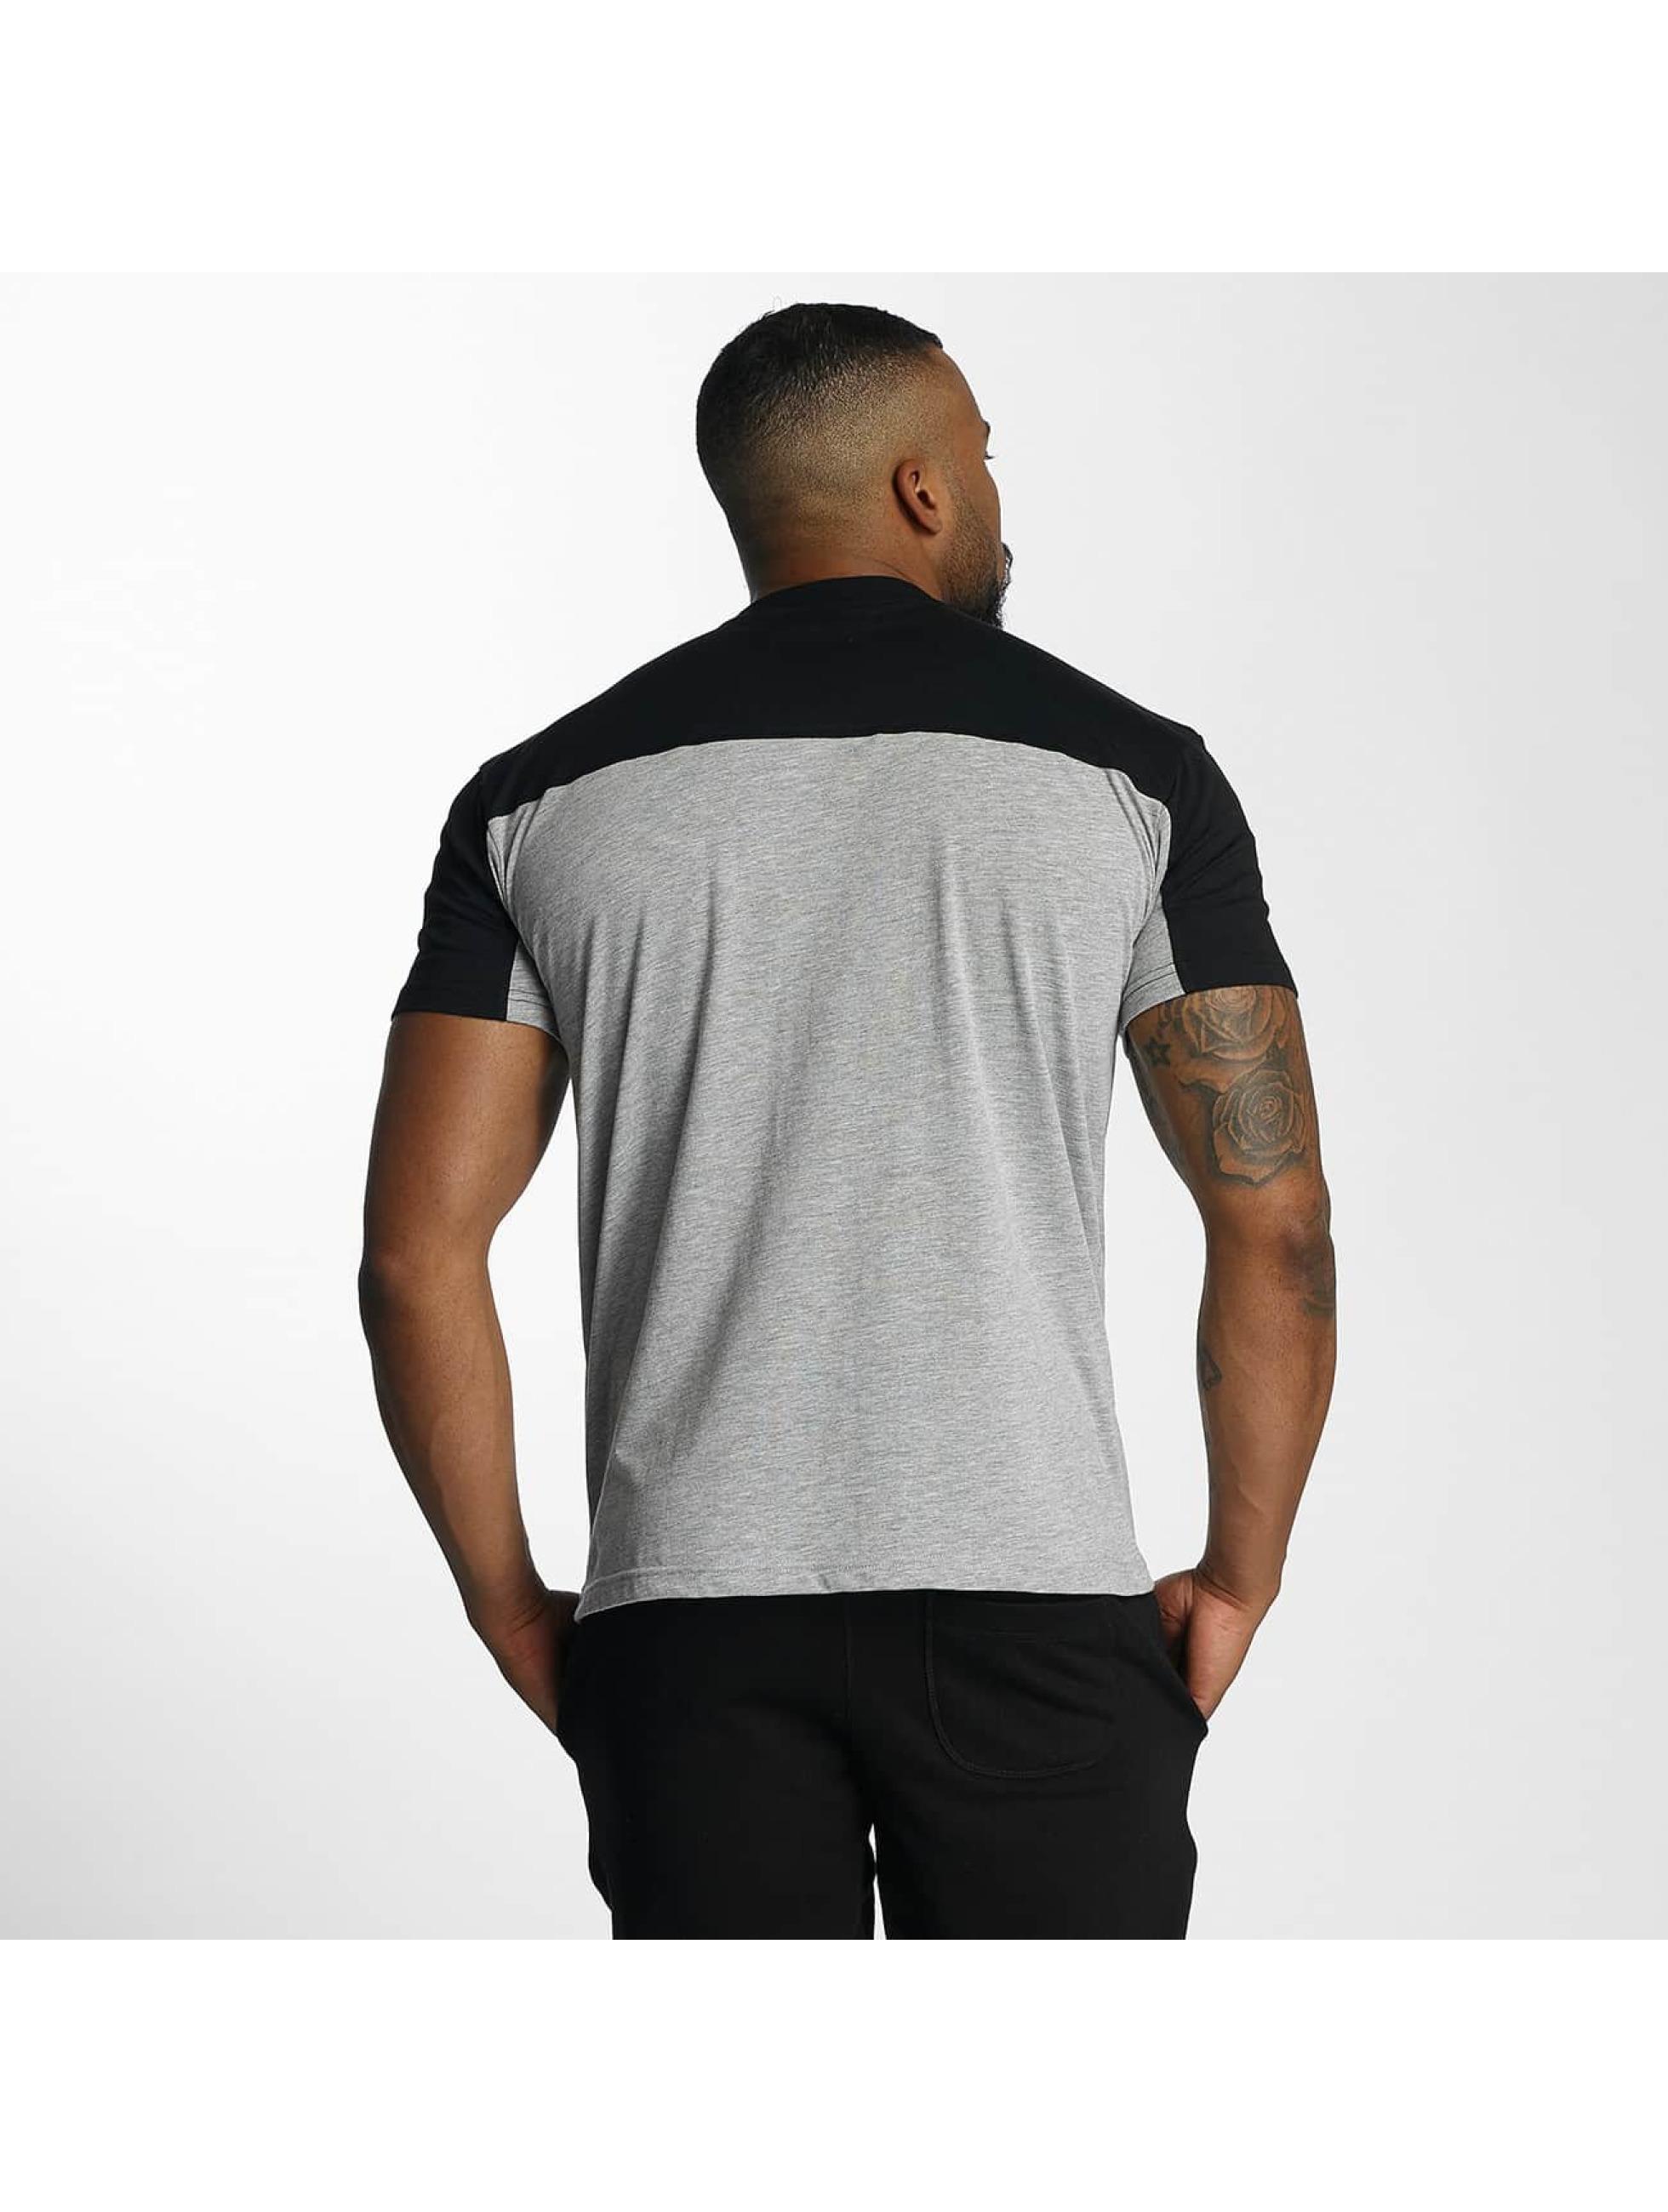 Pusher Apparel T-shirt 137 Riot grigio